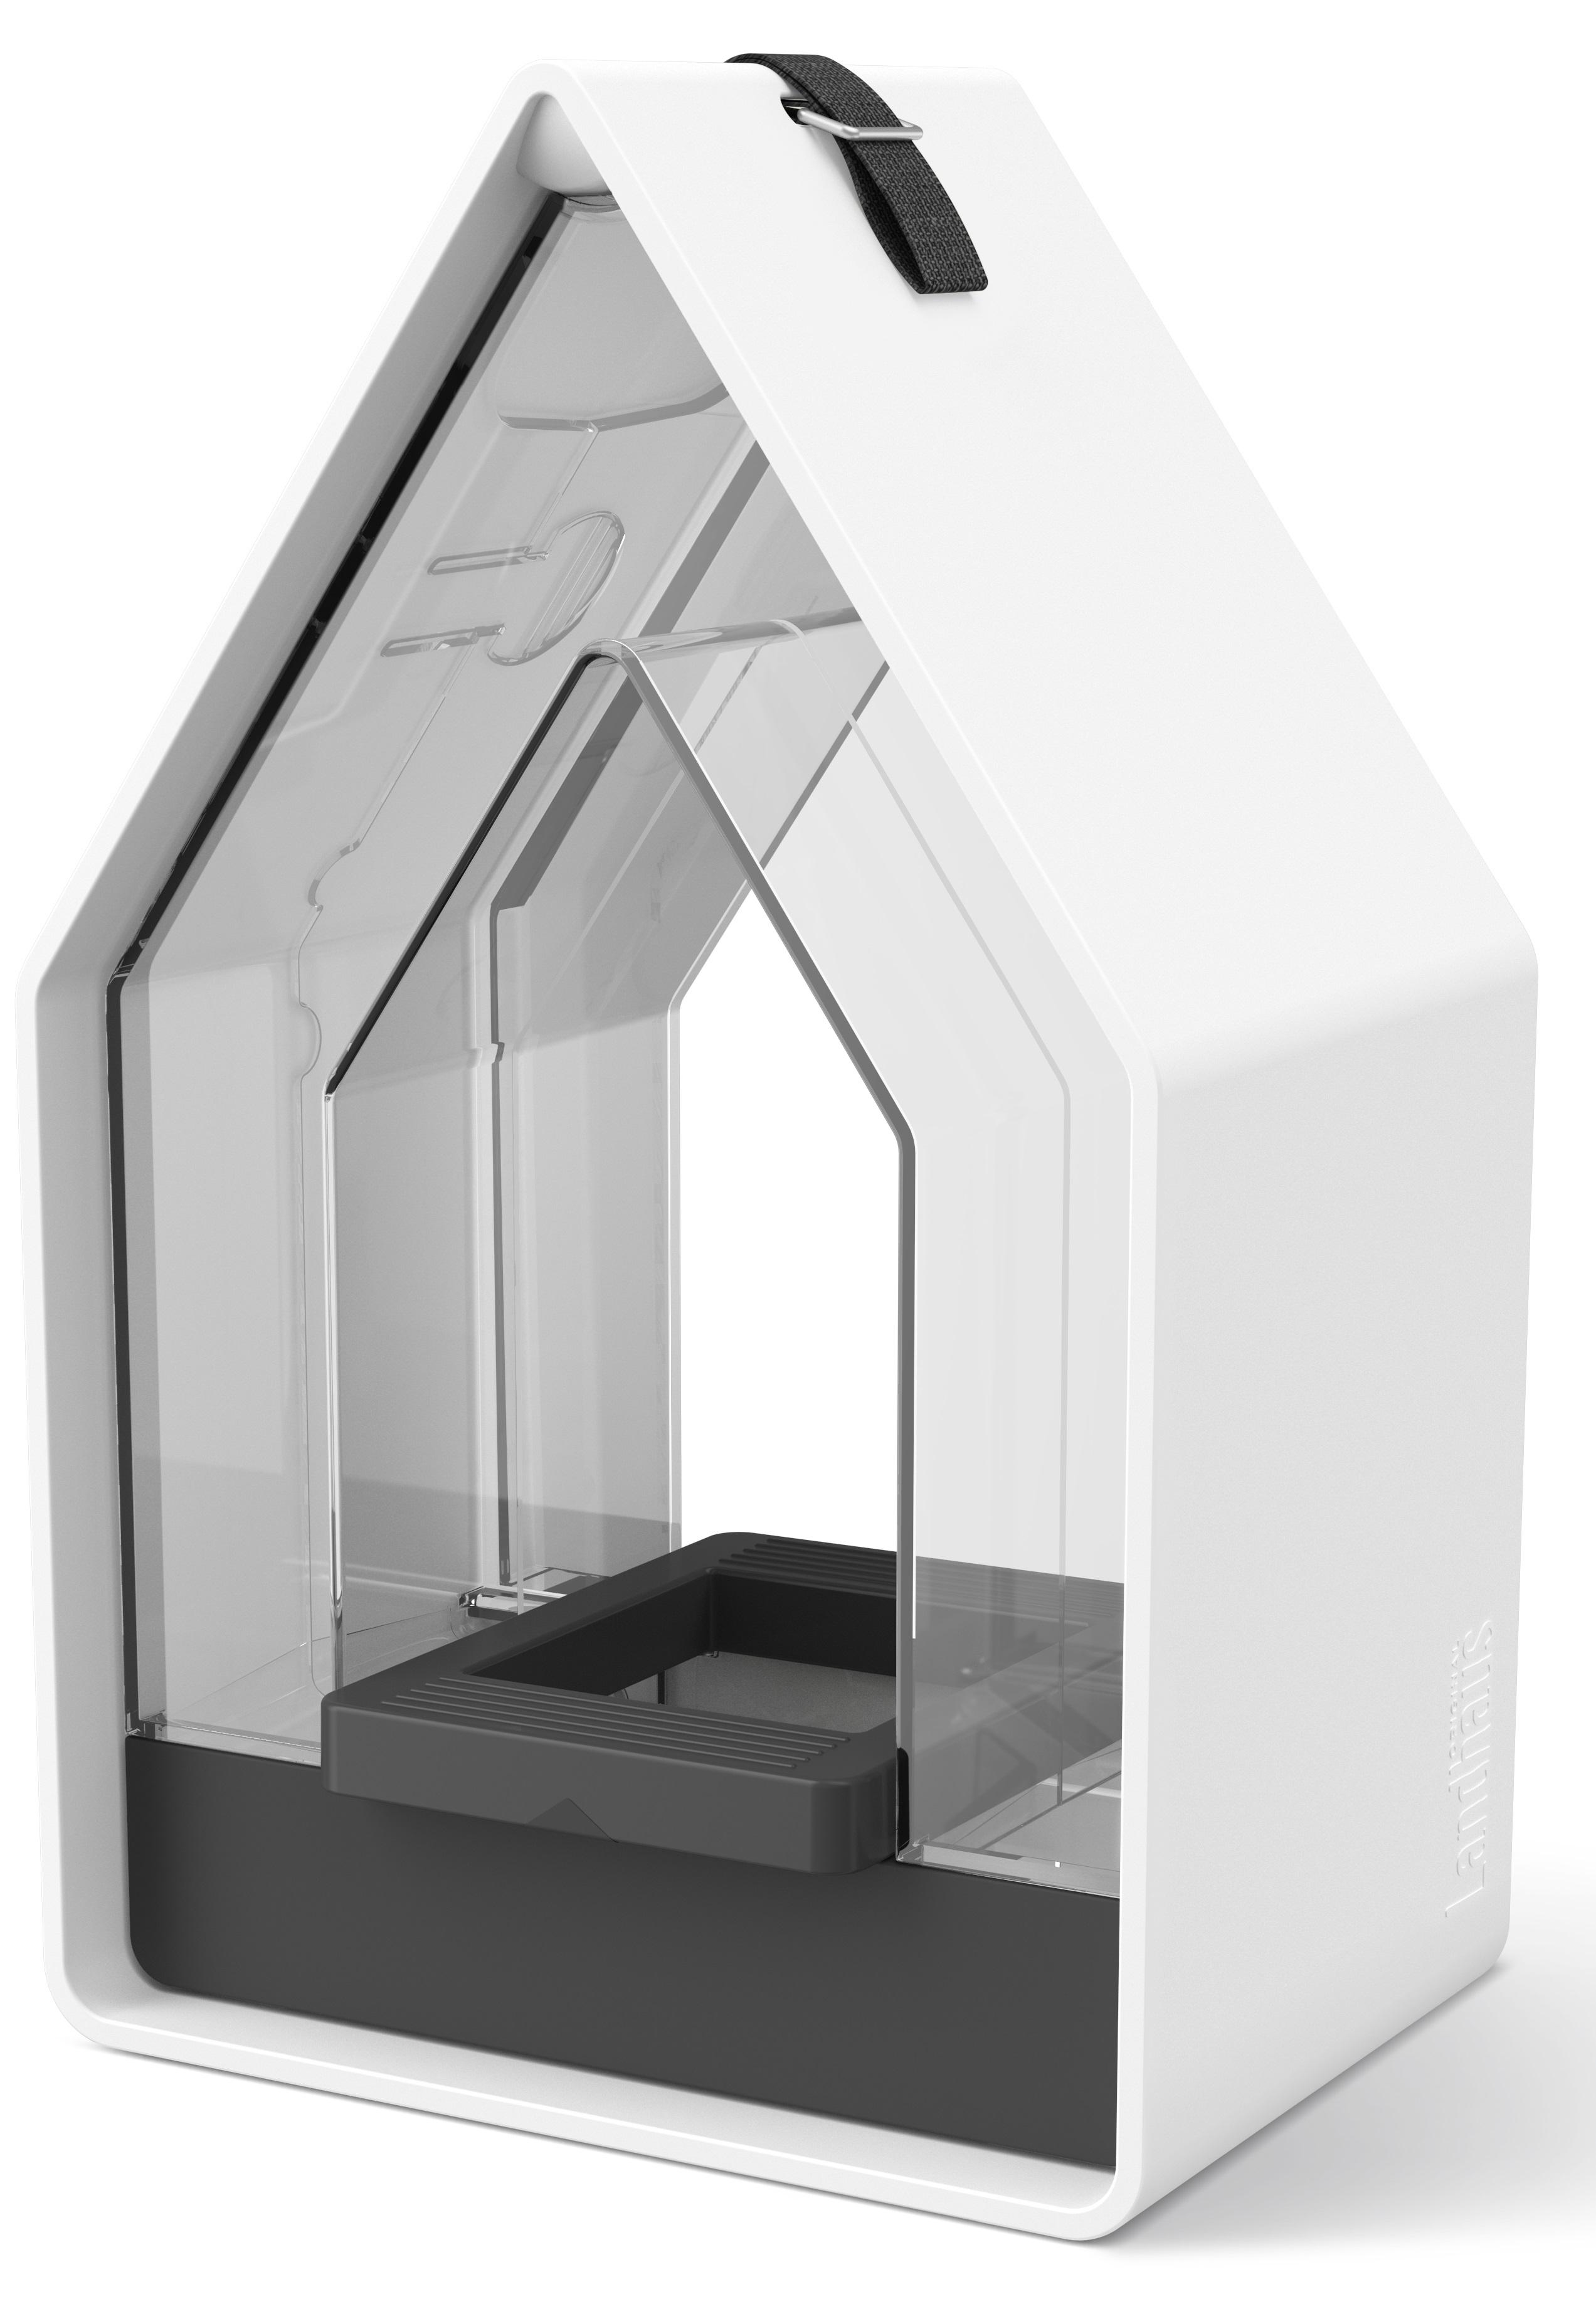 EMSA Krmítko se zásobníkem 15 x 24 cm bílá/šedá Landhaus Emsa